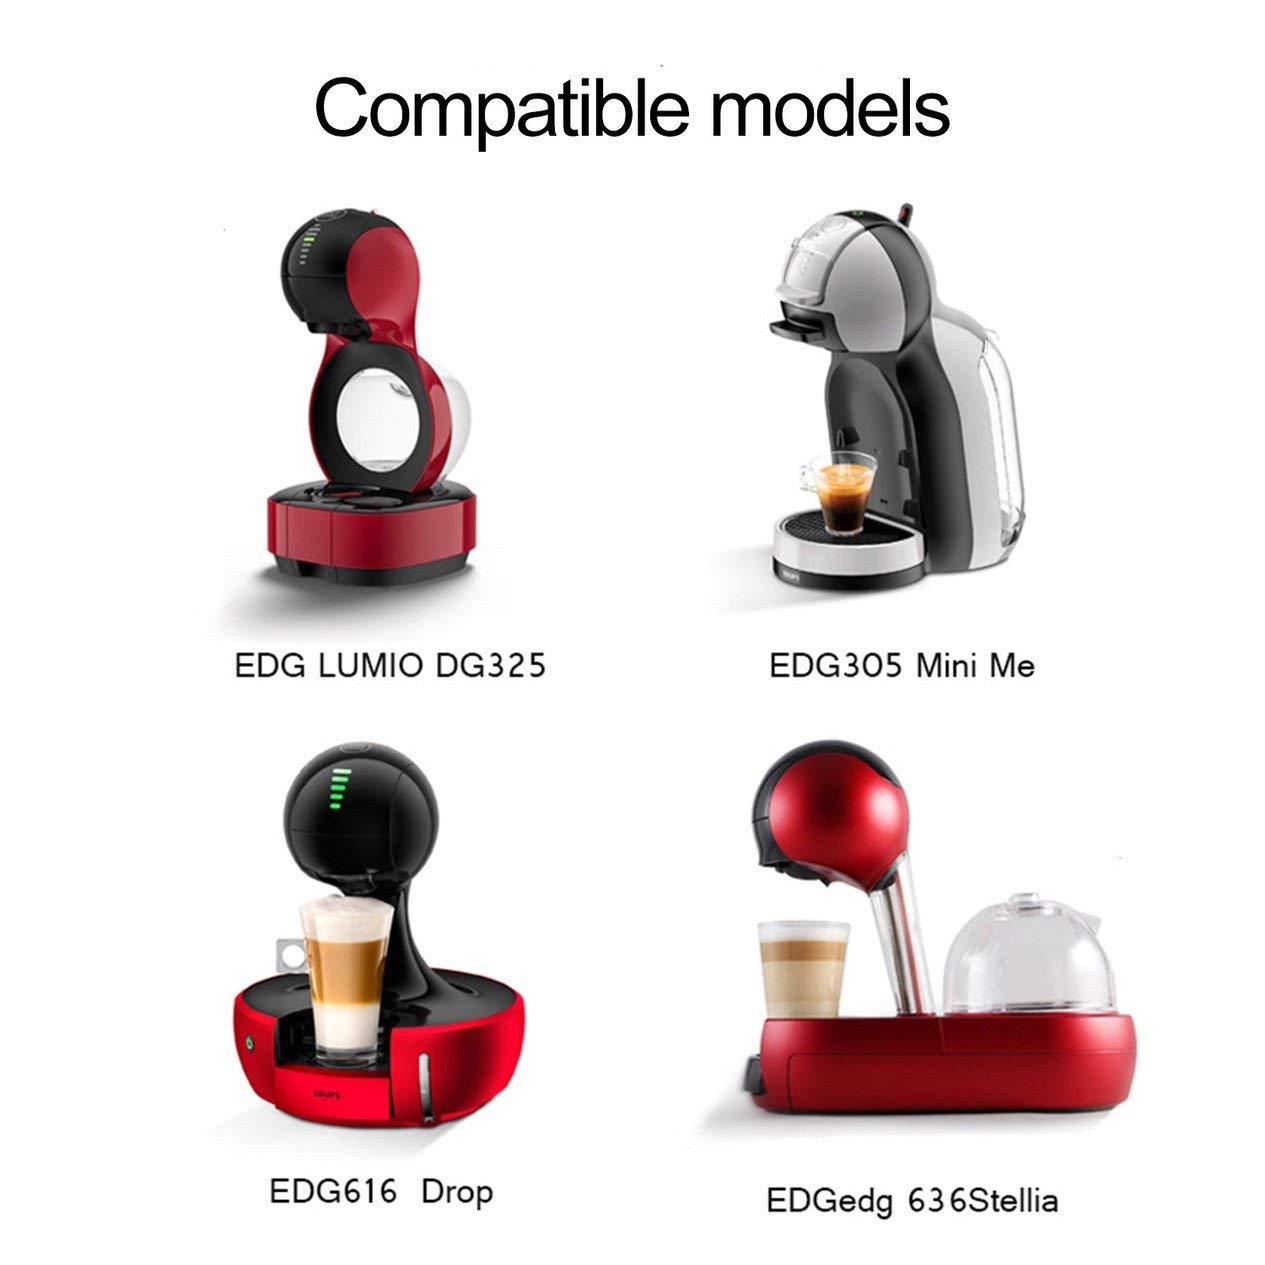 IronHeel Metal Rusable Coffee Capsule Filtro de Acero Inoxidable para Dolce Gusto EDG Lumio Filtro de Recarga Recargable Tamper Plata